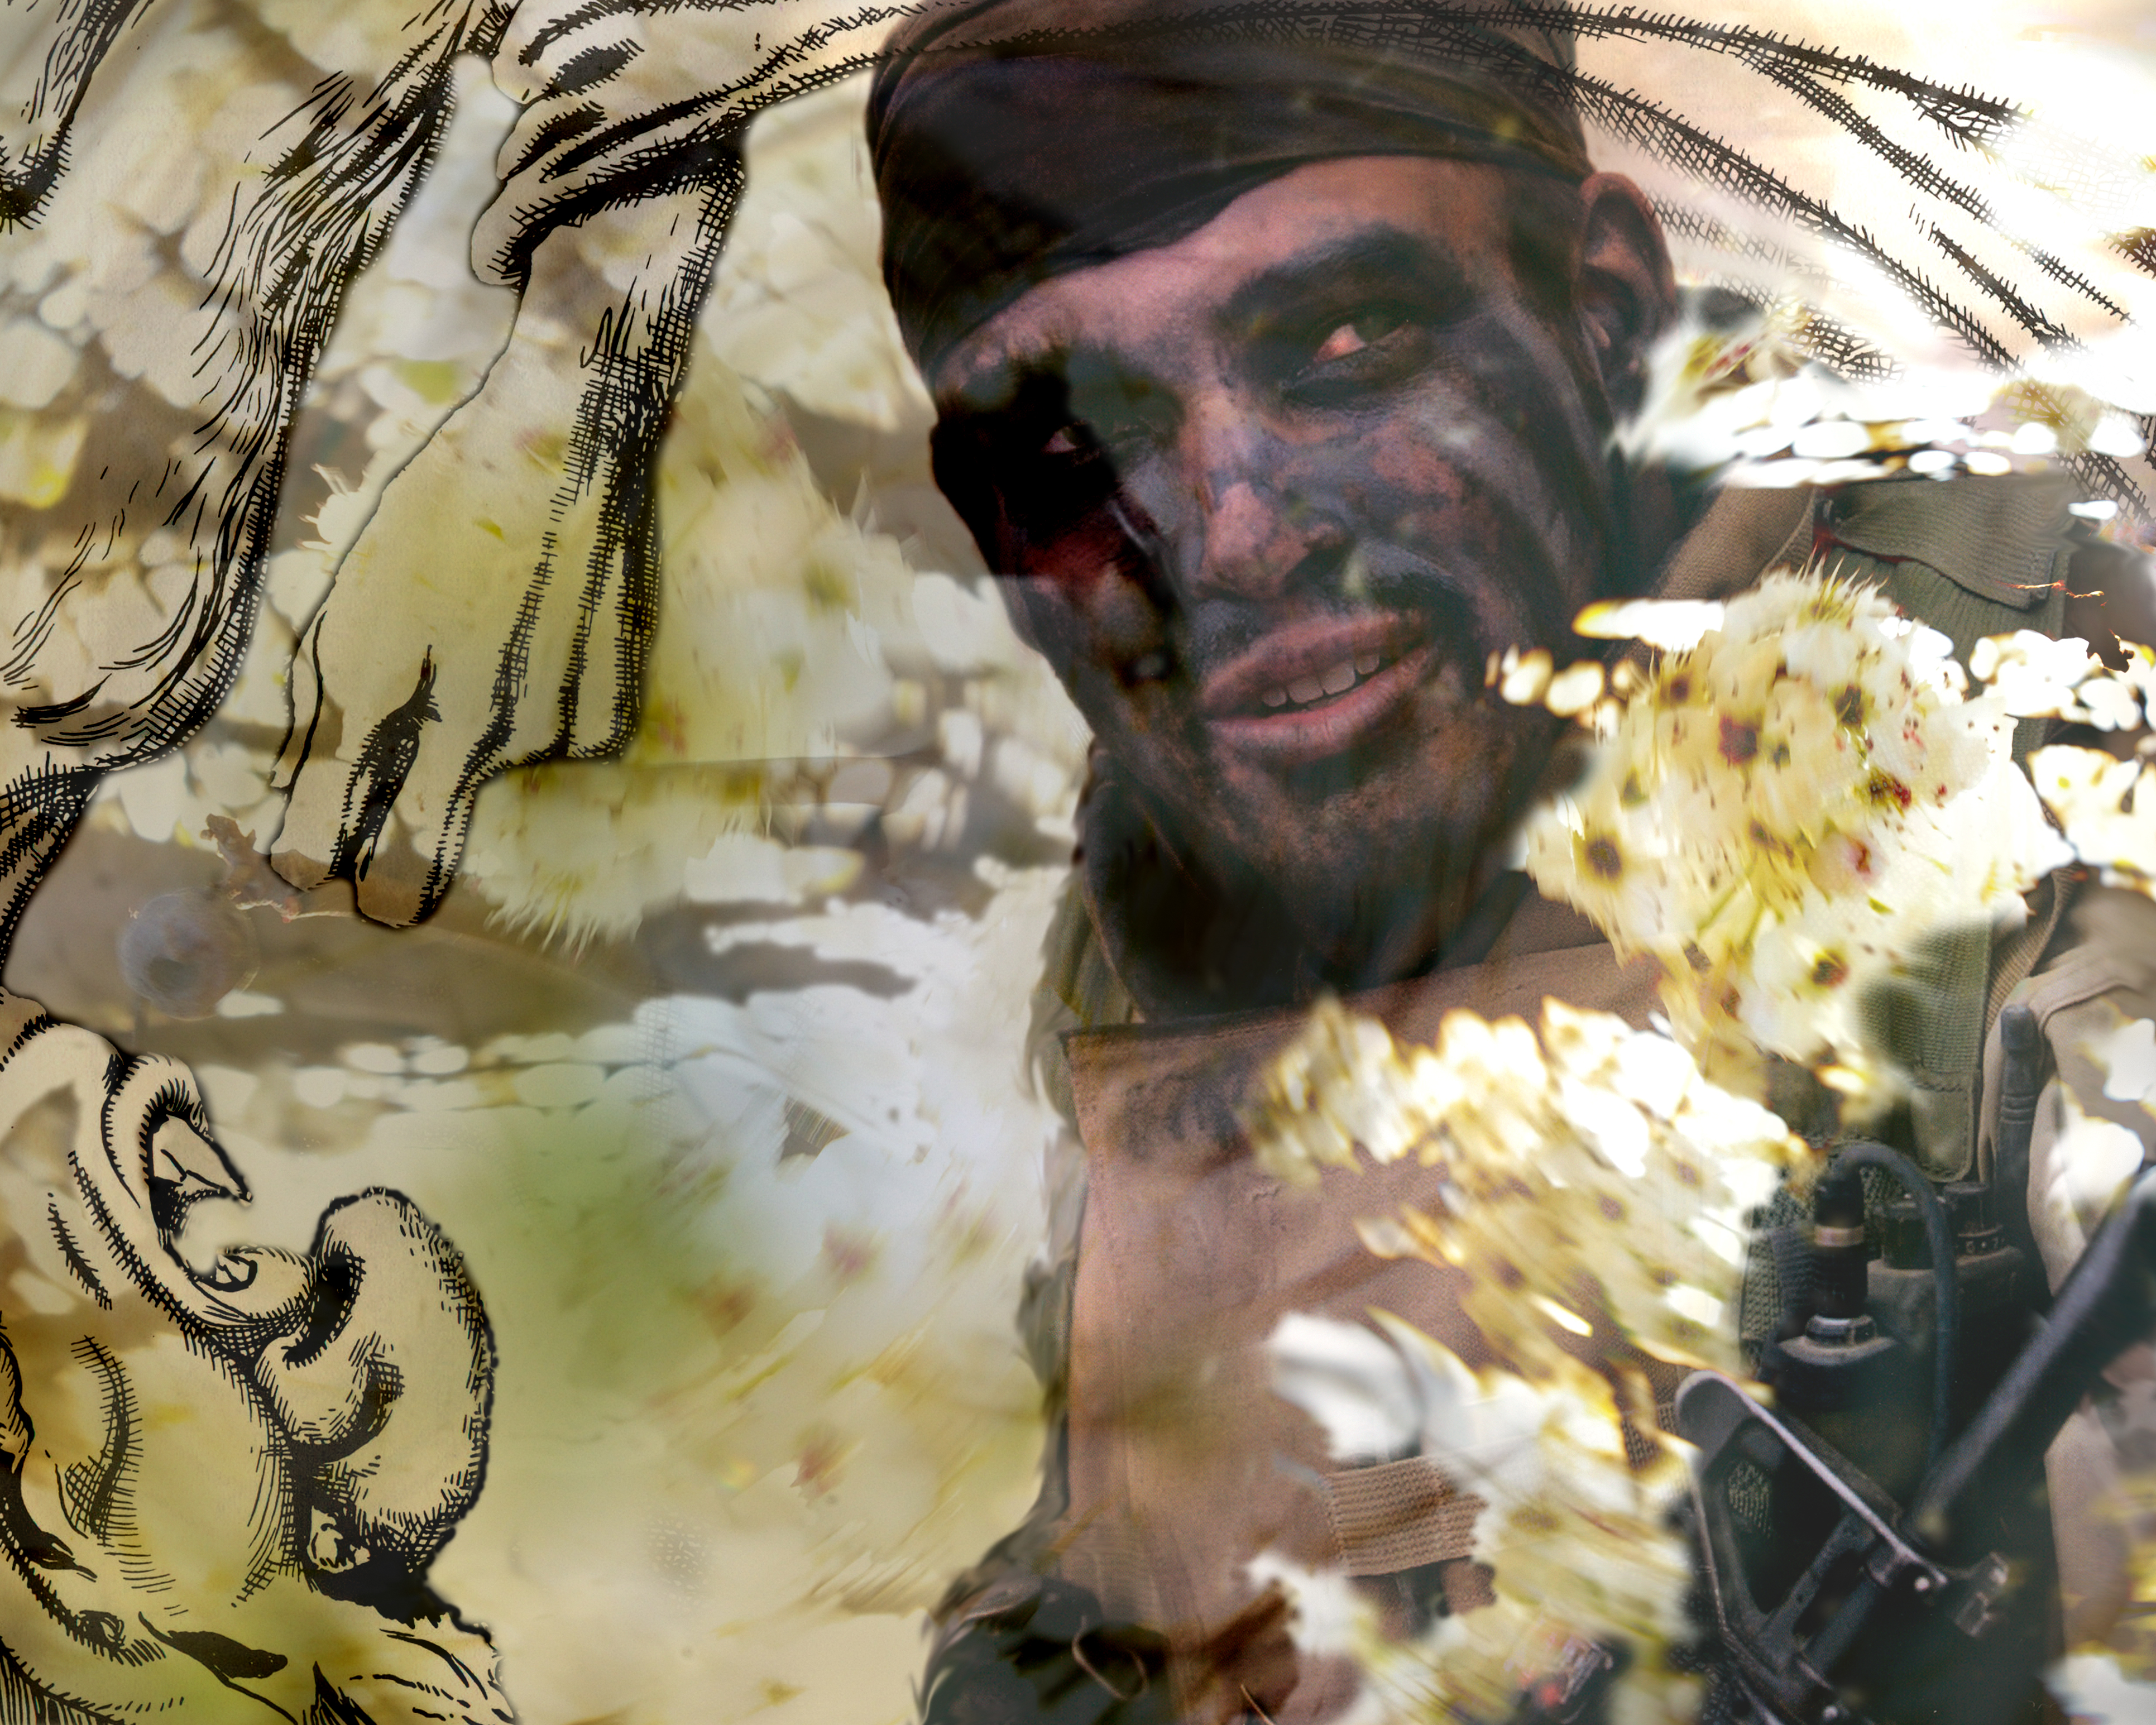 Iraqsoldierfacepaint20x16